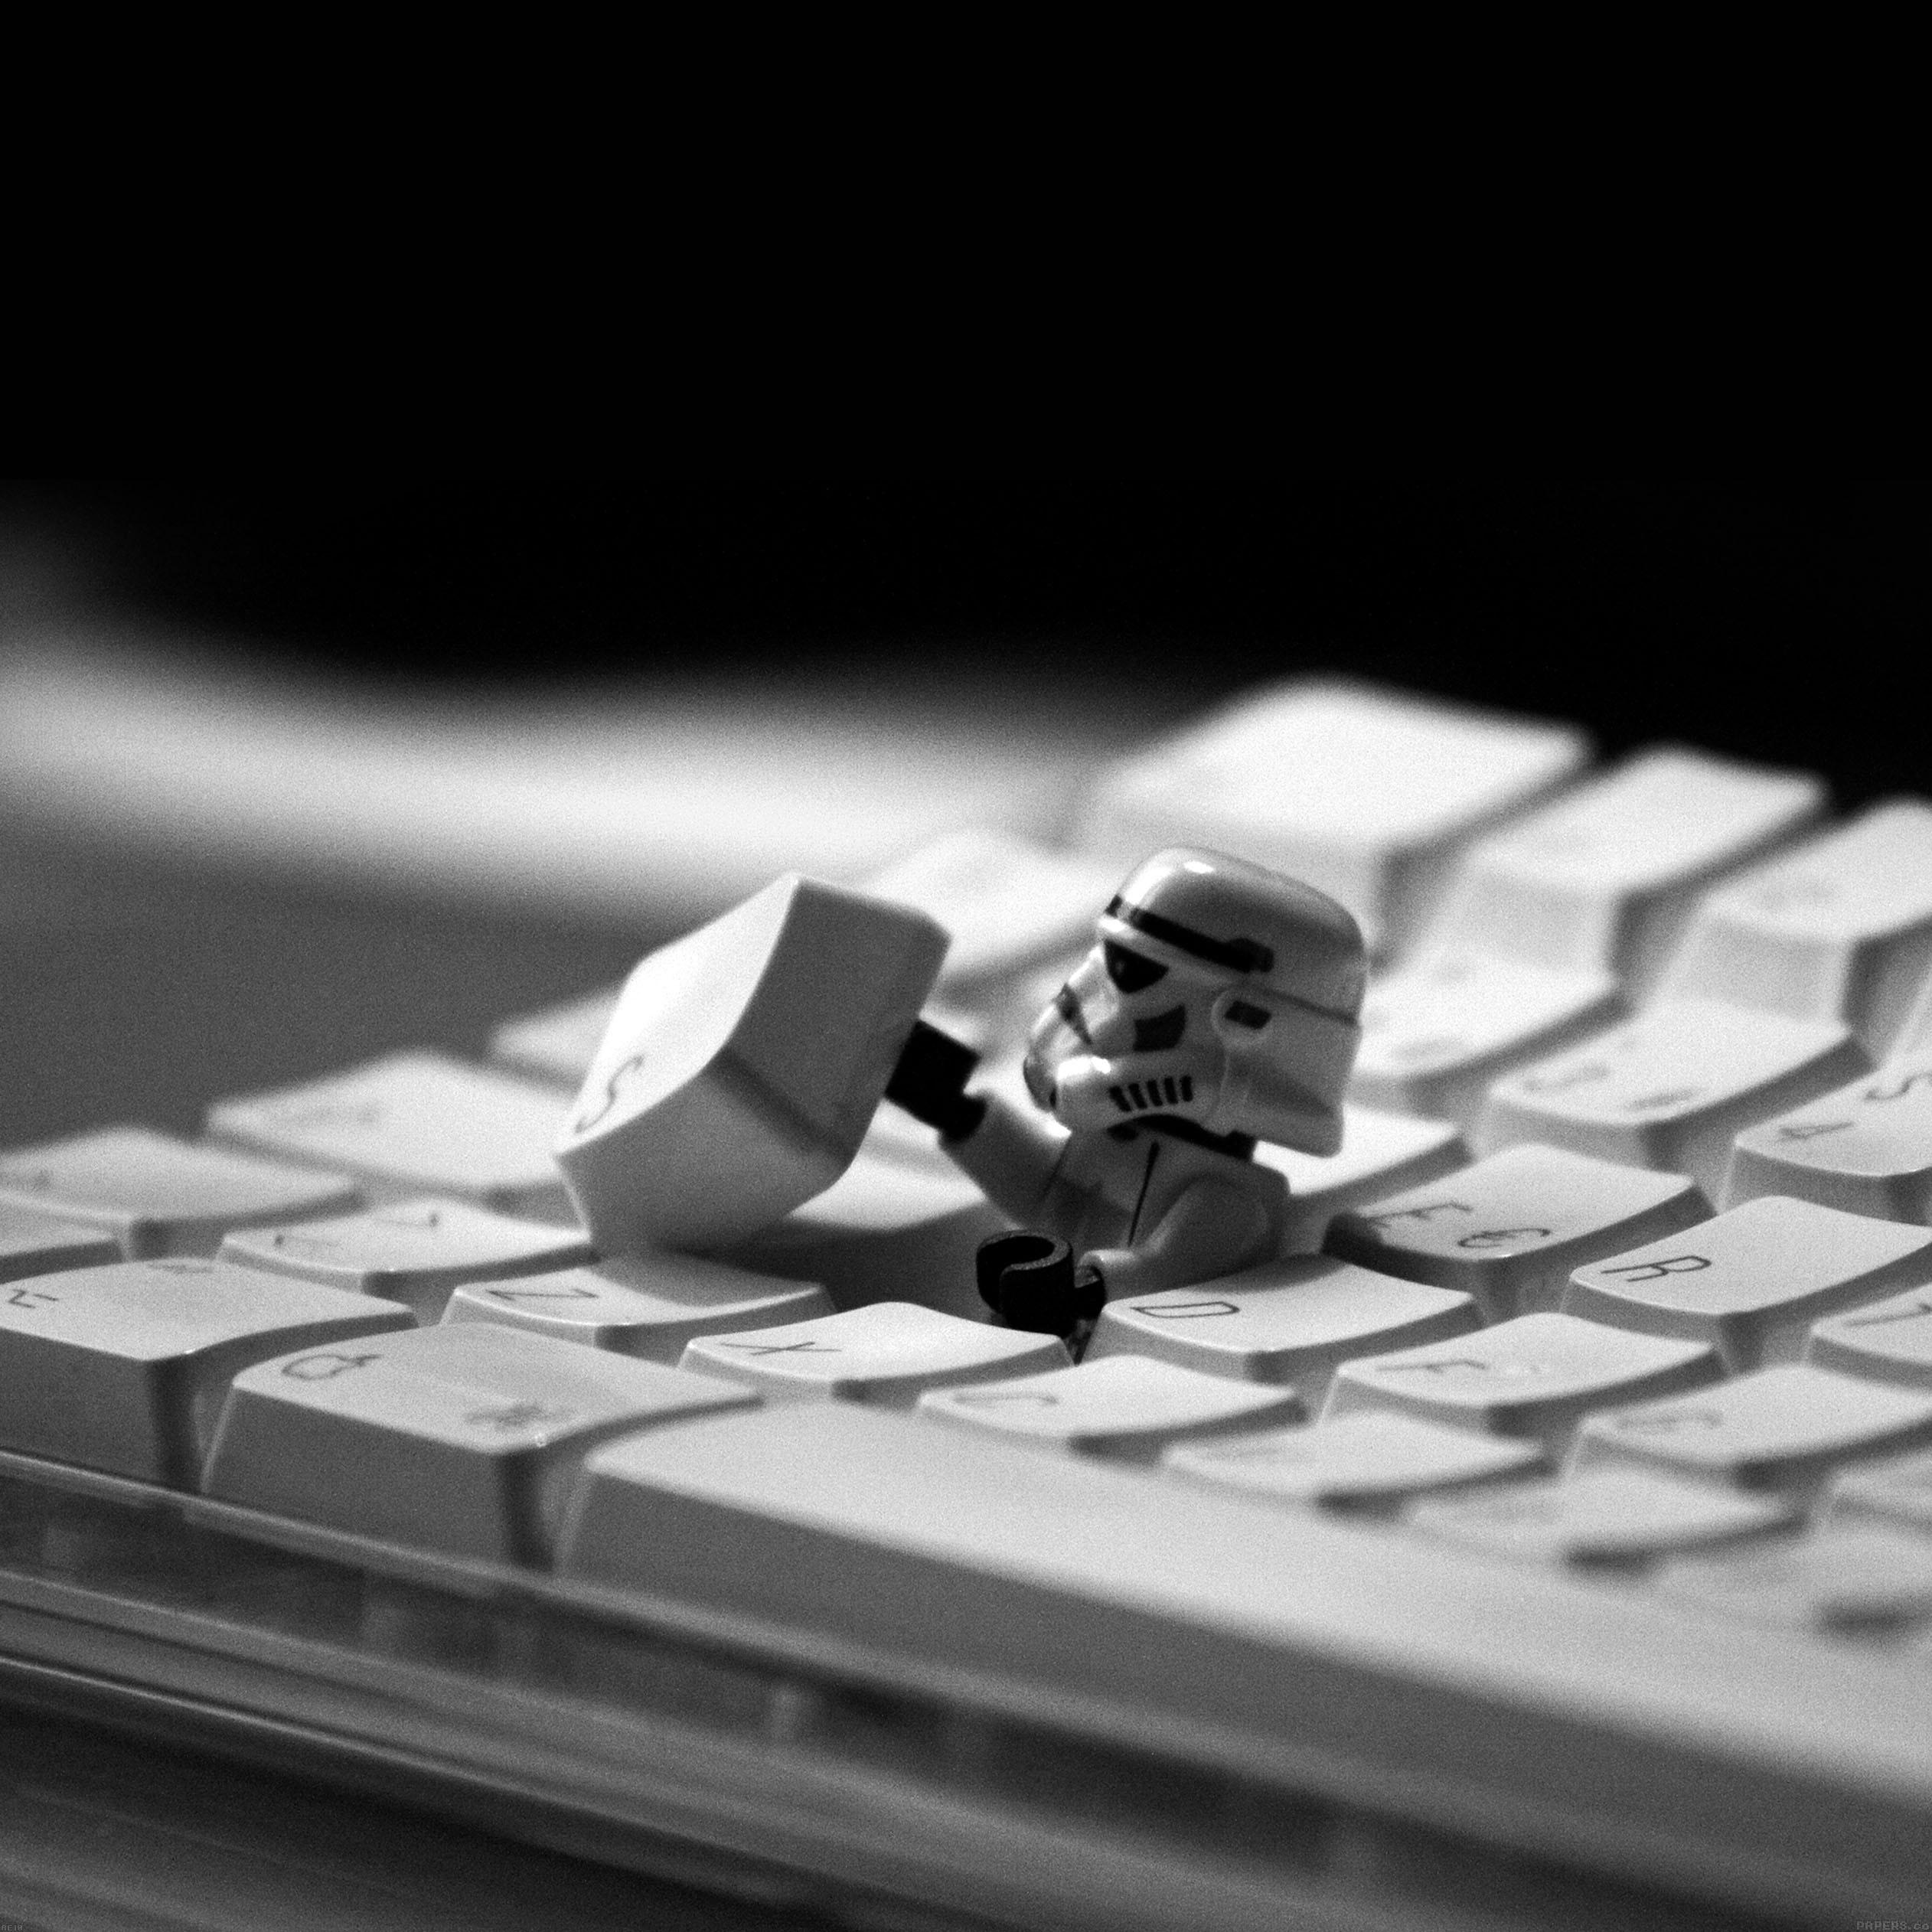 storm-trooper-starwars-keyboard-film-9-wallpaper